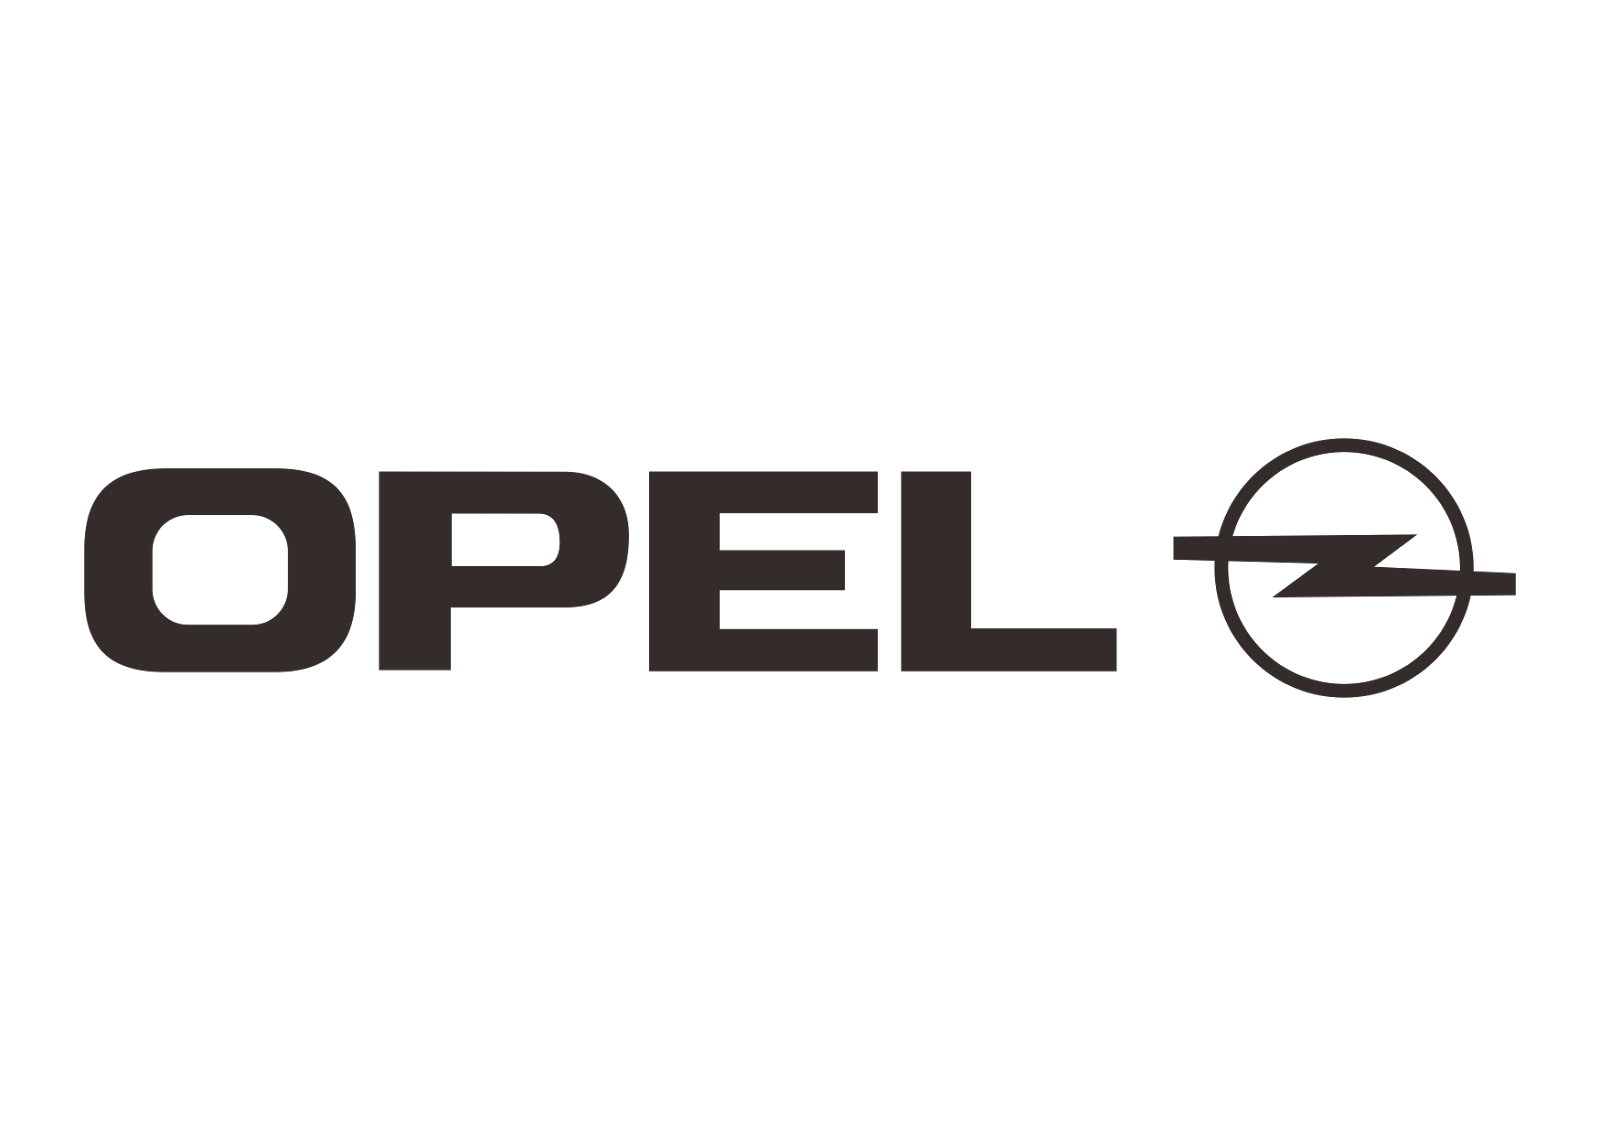 Opel Design Part 2 Black White Logo Vector Format Cdr